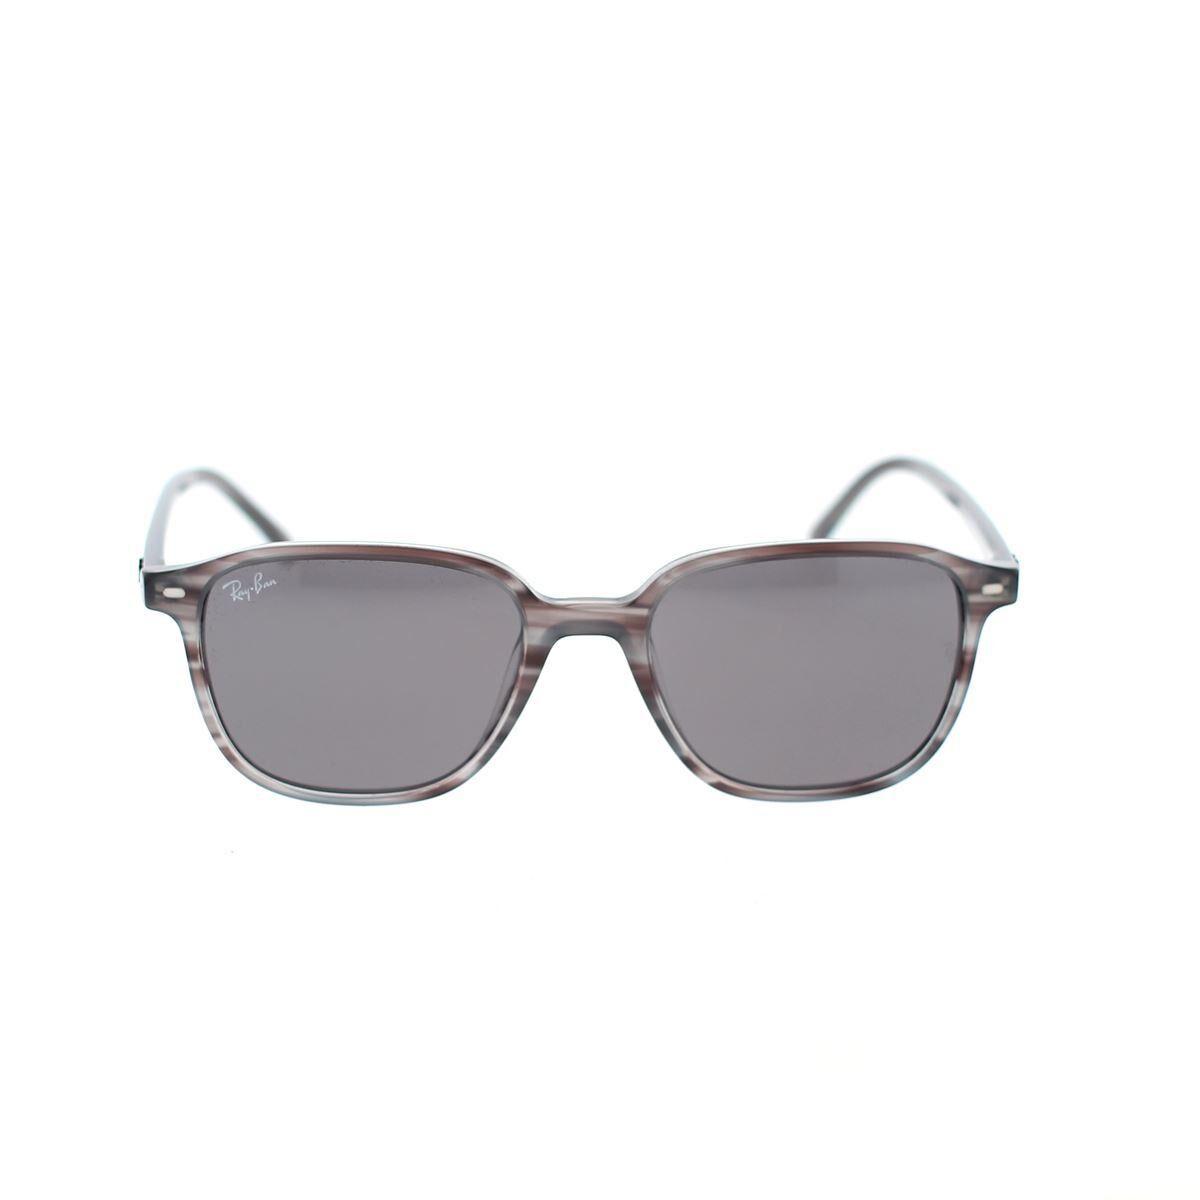 ray-ban occhiali da sole leonard rb2193 1314b1